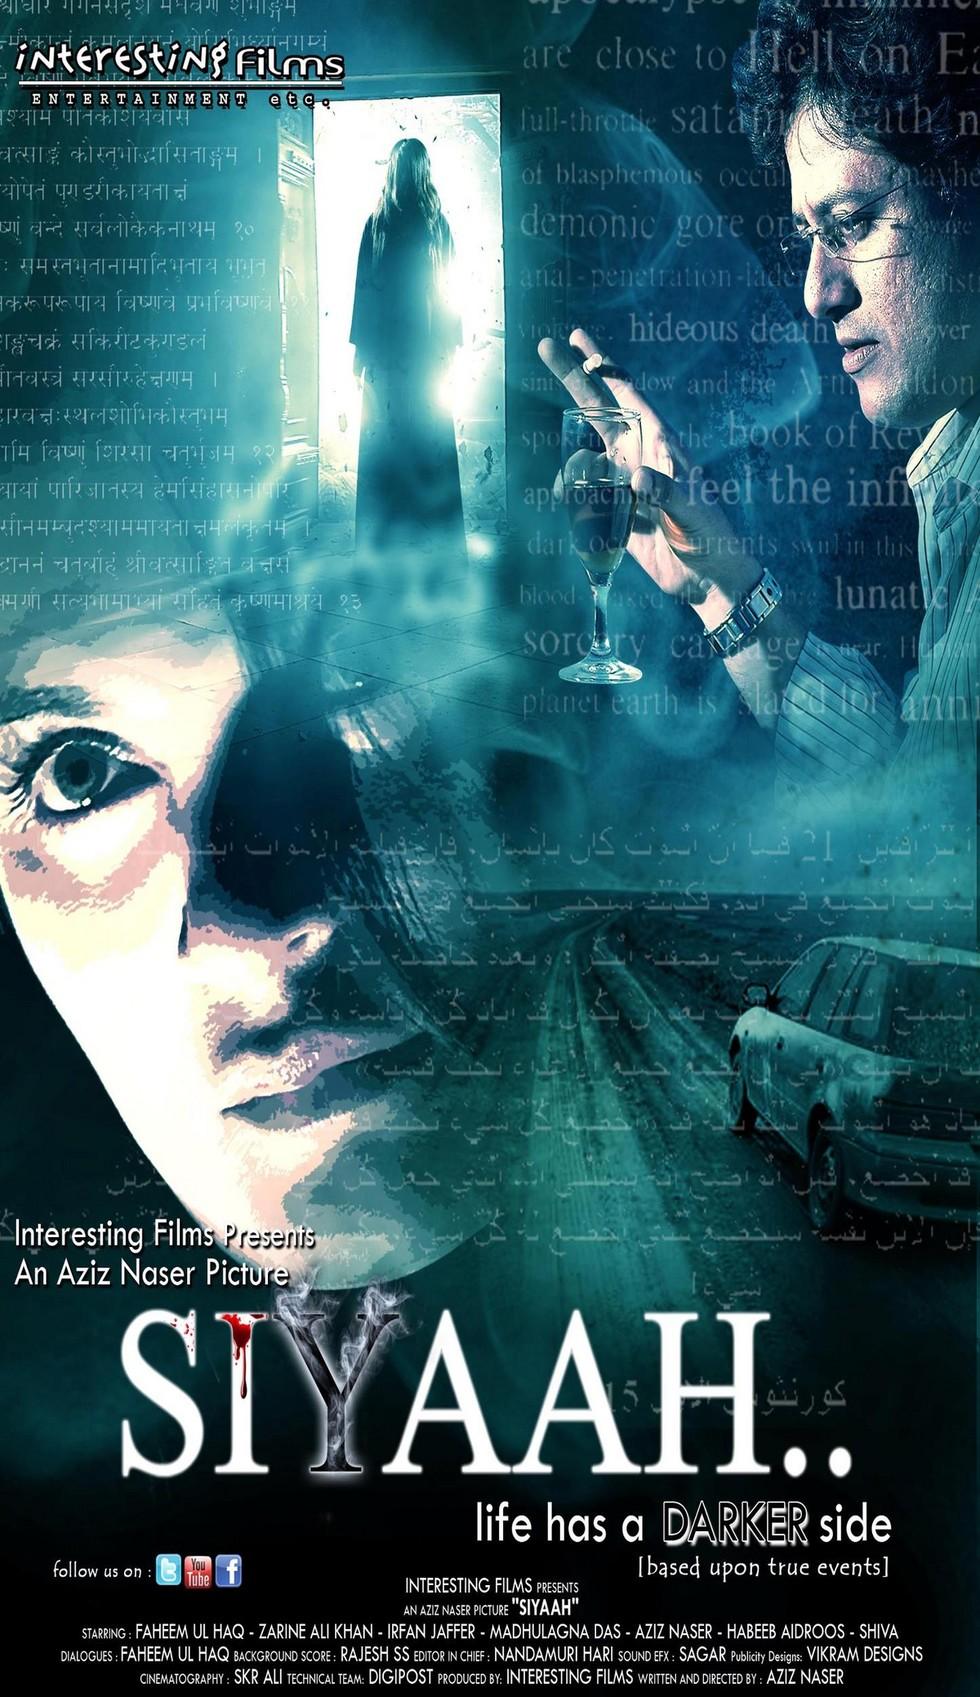 Siyaah.. - Movie Poster #1 (Large)